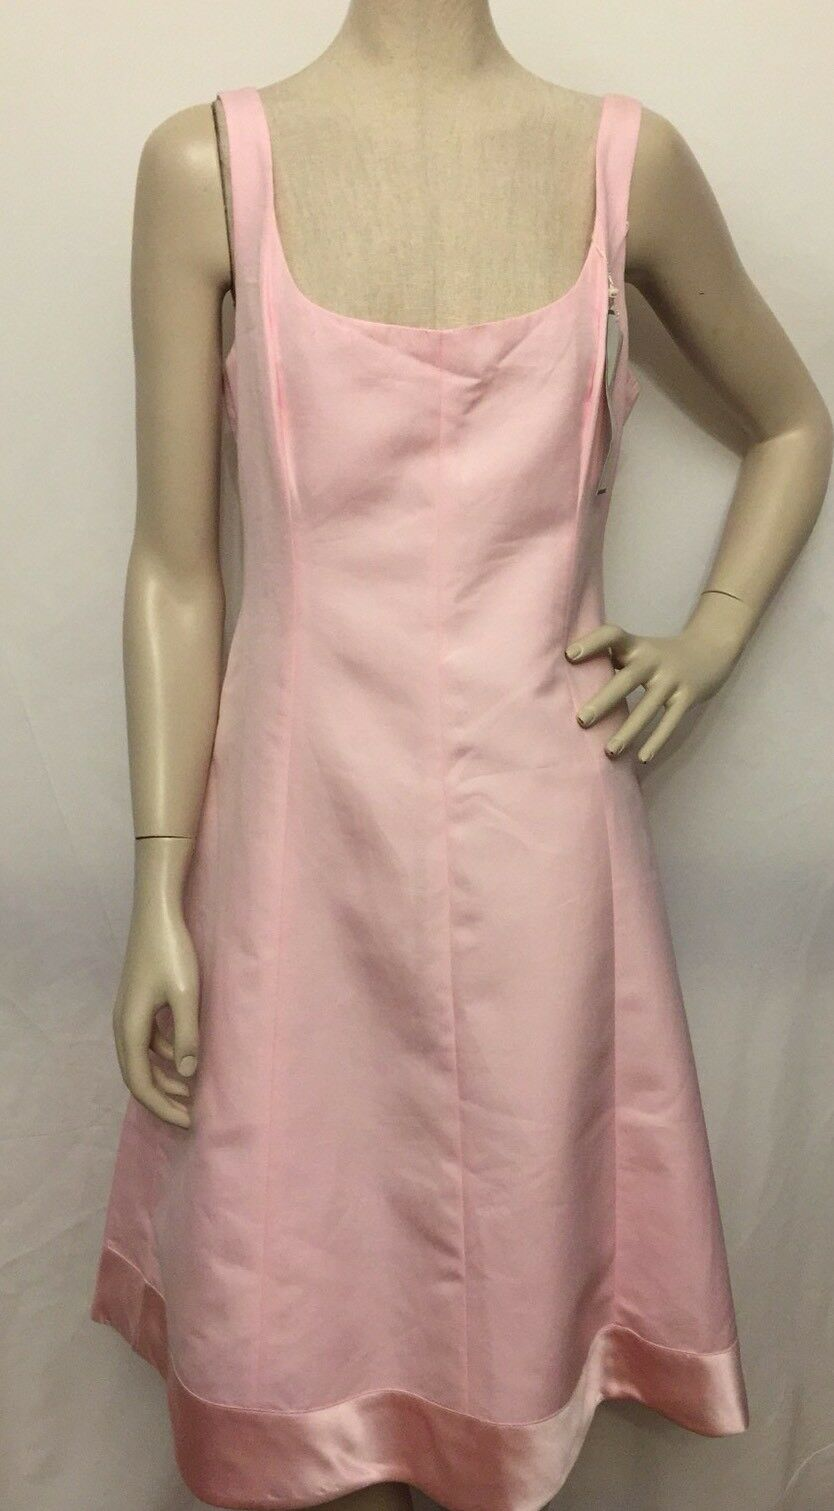 J Crew Rosa Special Occasion Sleeveless Dress SZ 10